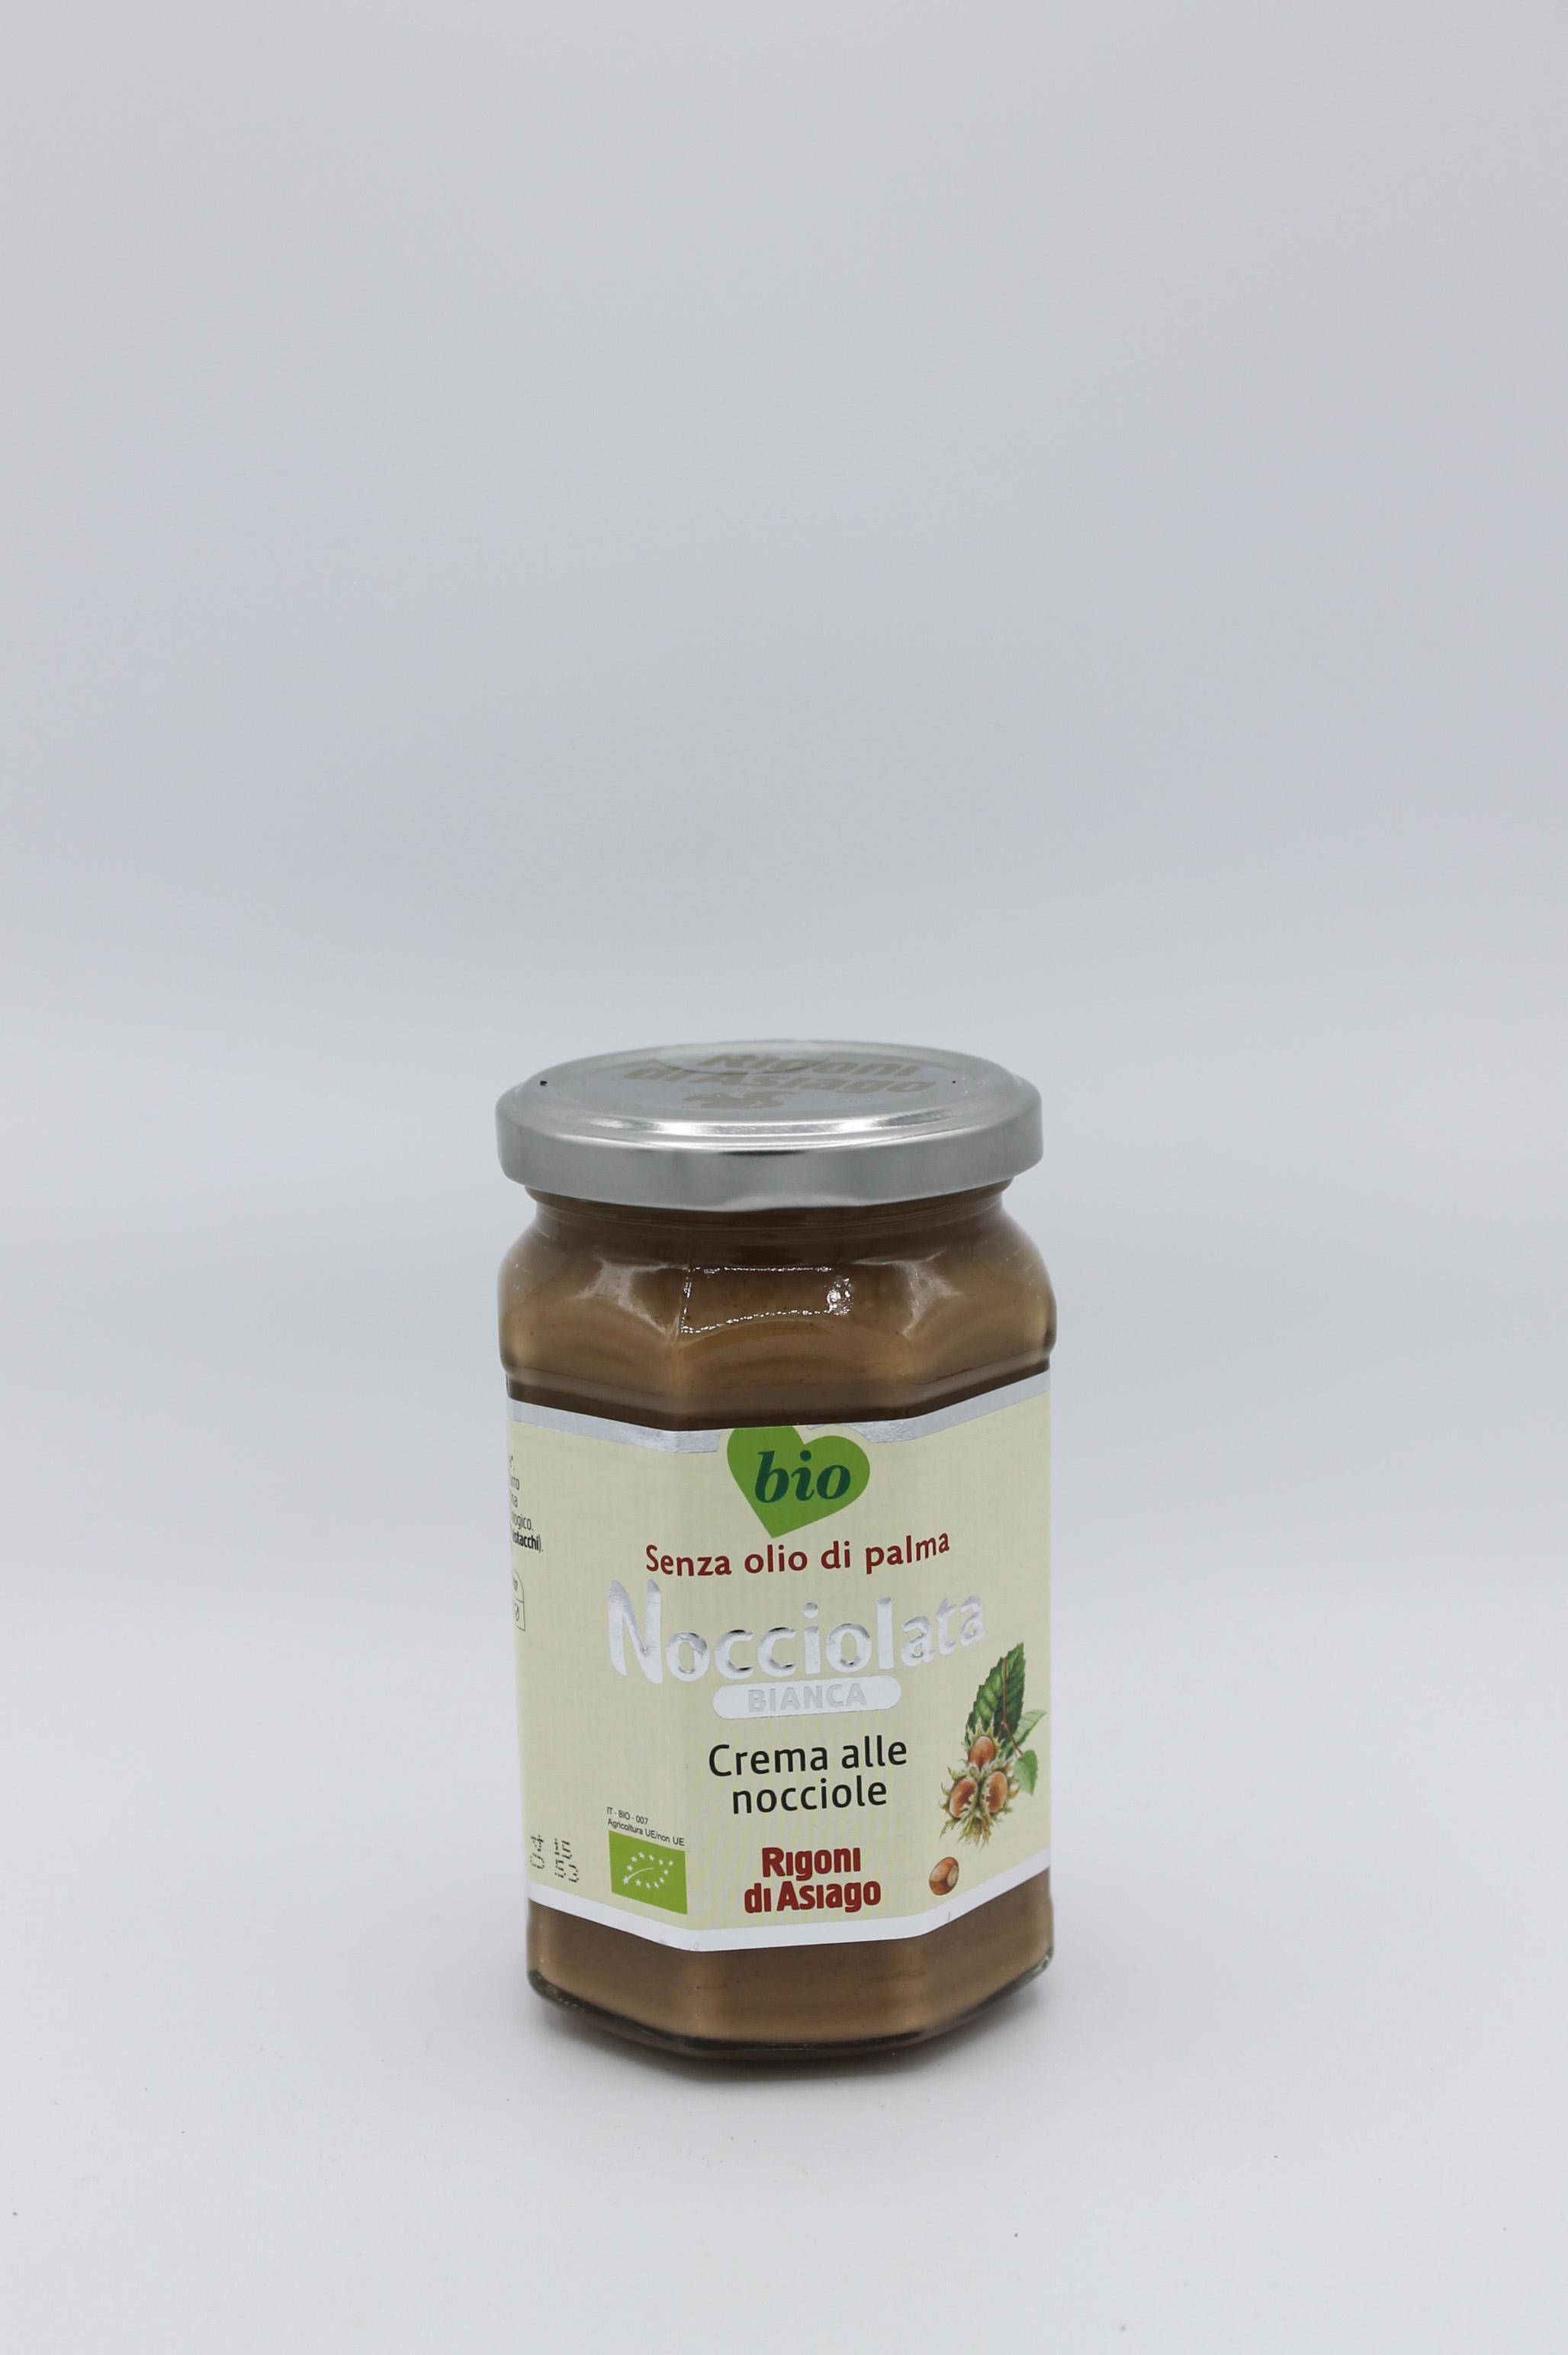 Rigoni crema spalmabile nocciolata bianca bio 350 gr.